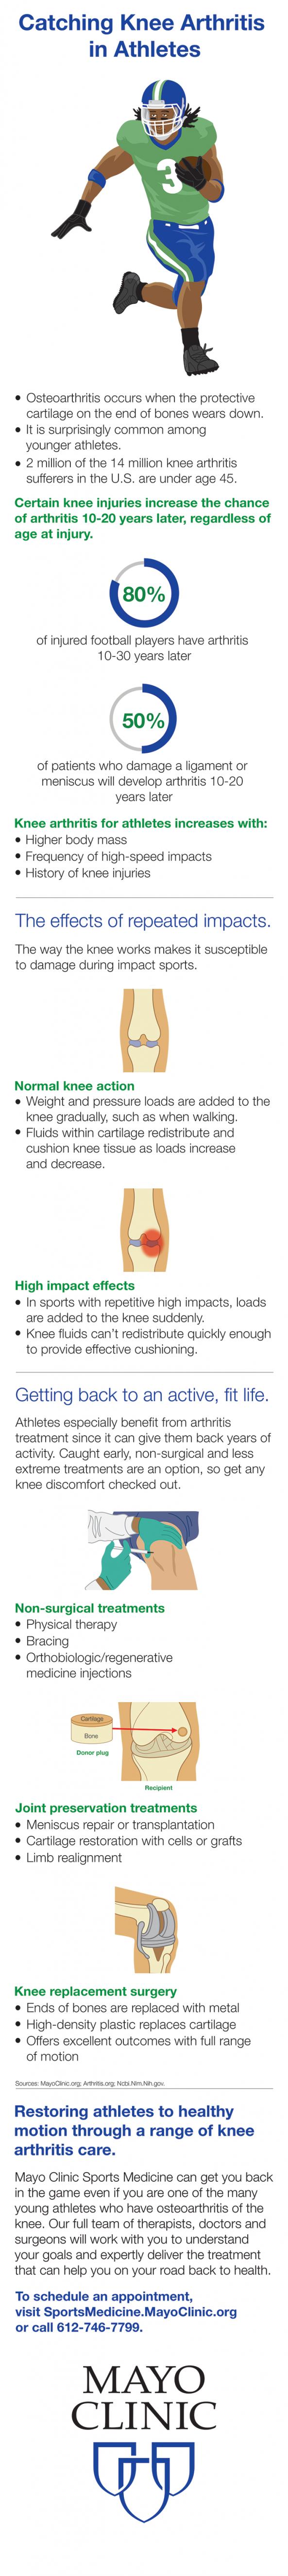 Catching Knee Arthritis in Athletes